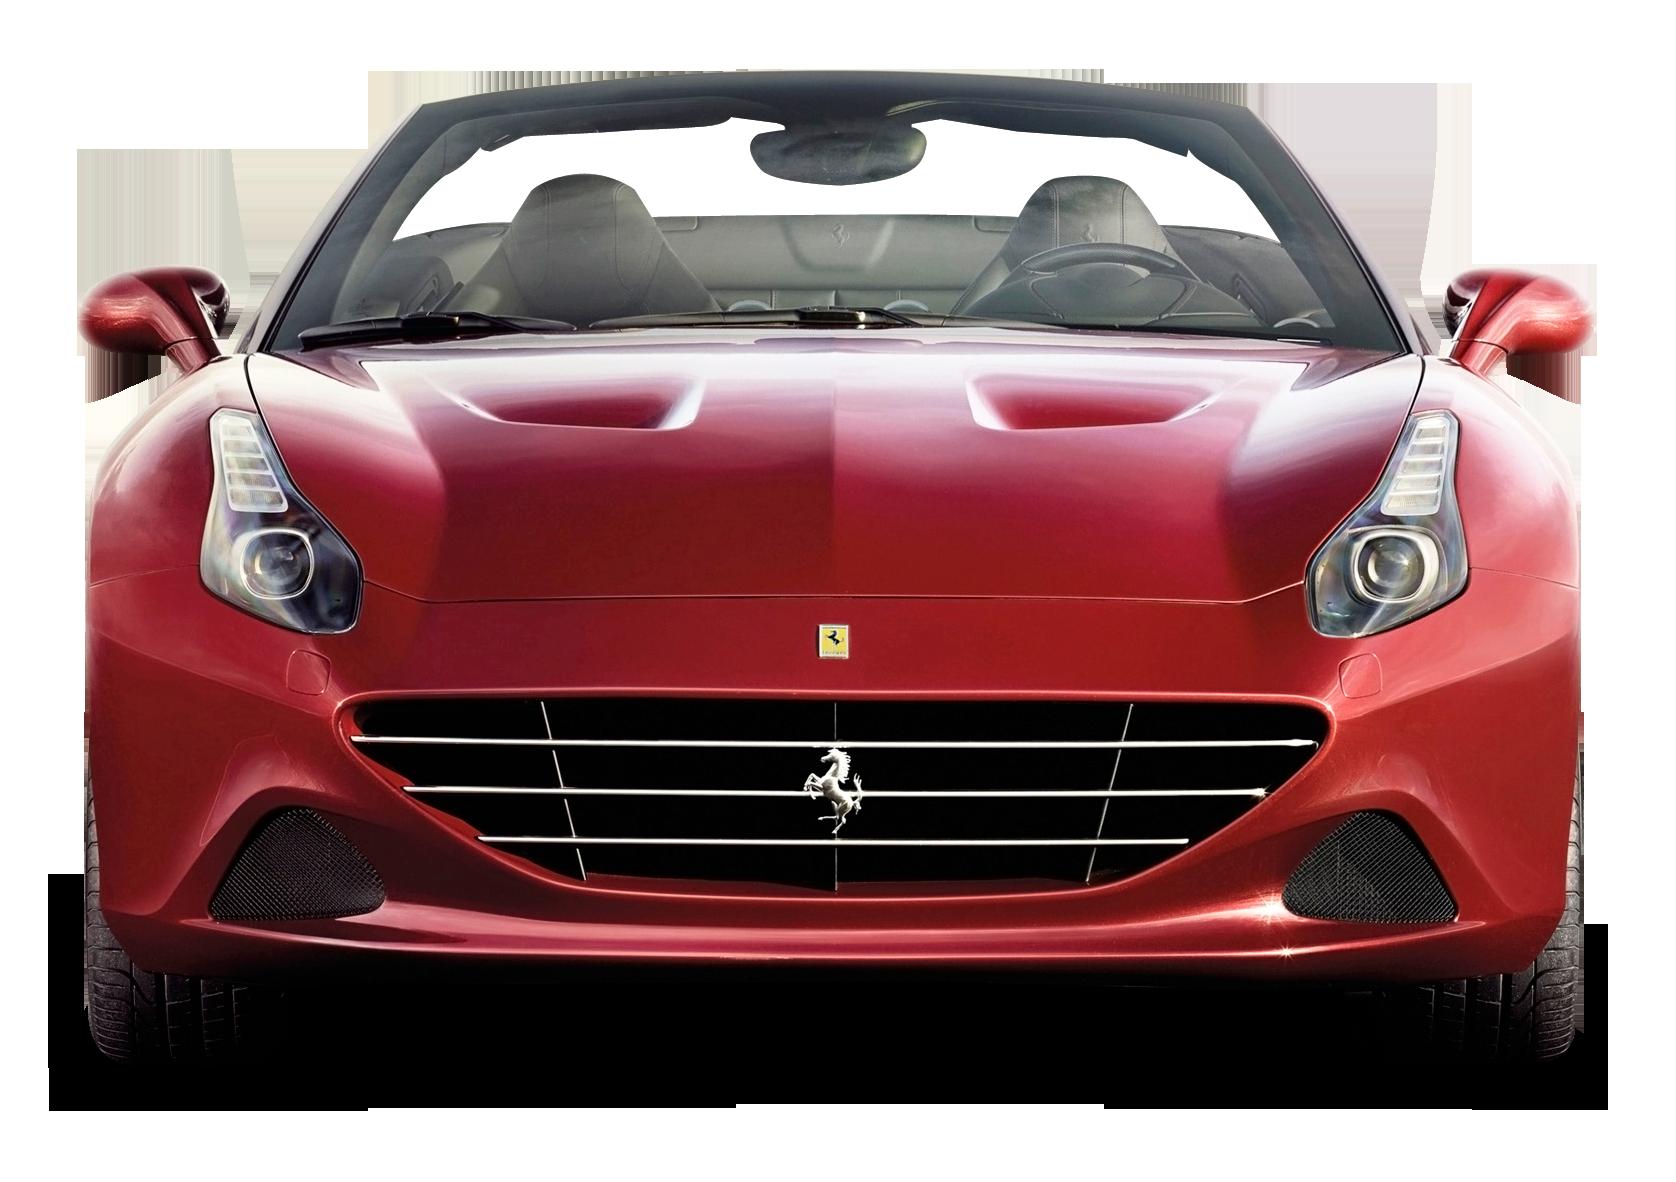 Transparent car front view clipart graphic free Geneva Motor Show Ferrari California T Sports car - Front ... graphic free